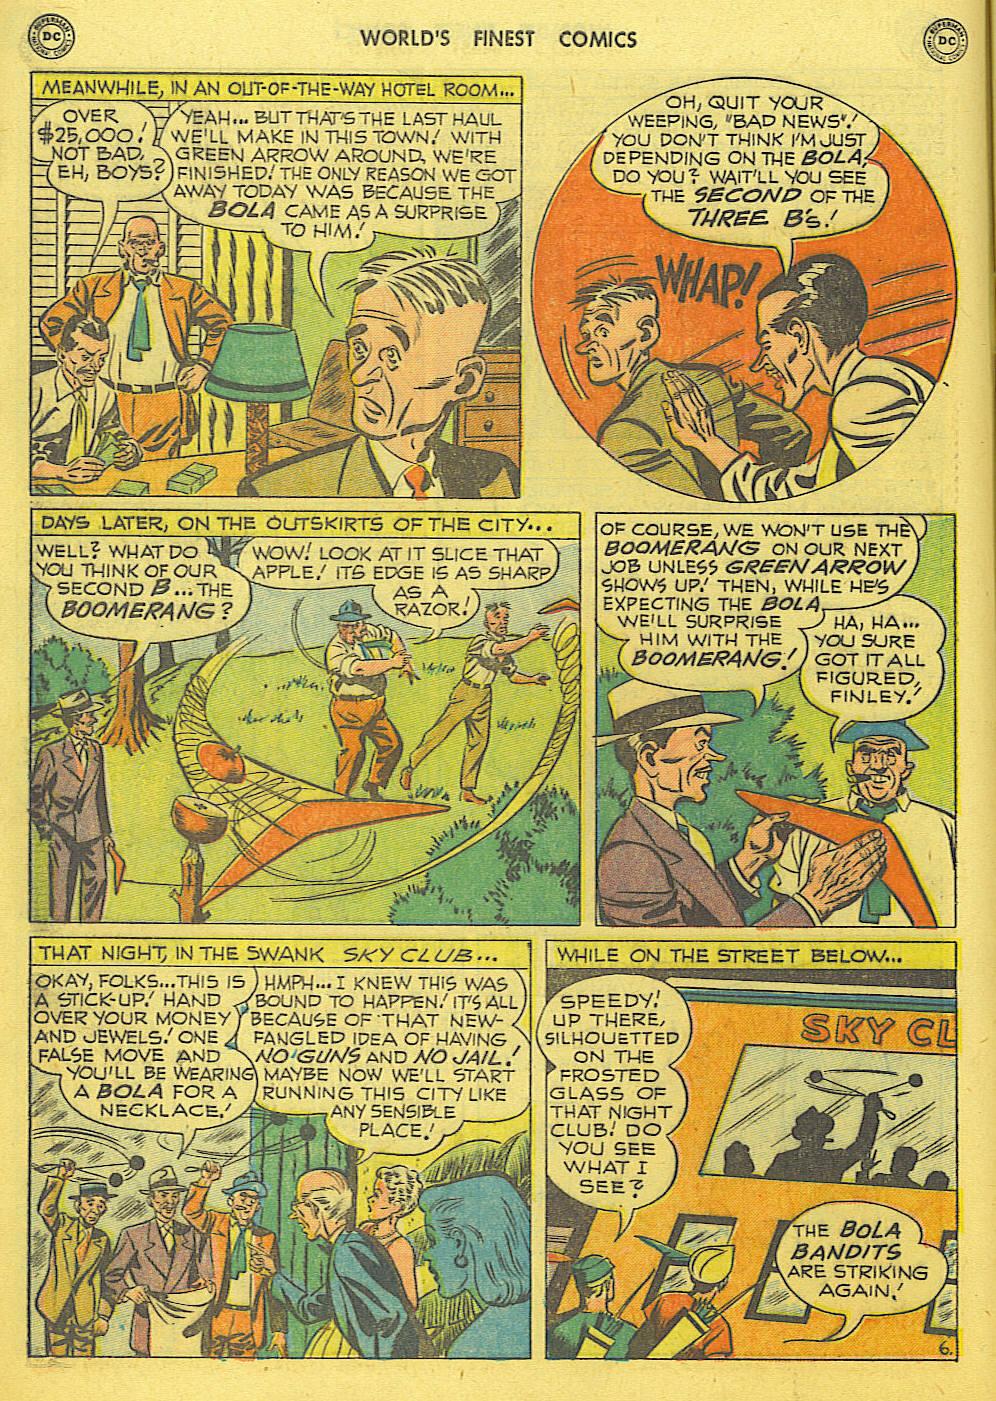 Read online World's Finest Comics comic -  Issue #49 - 23